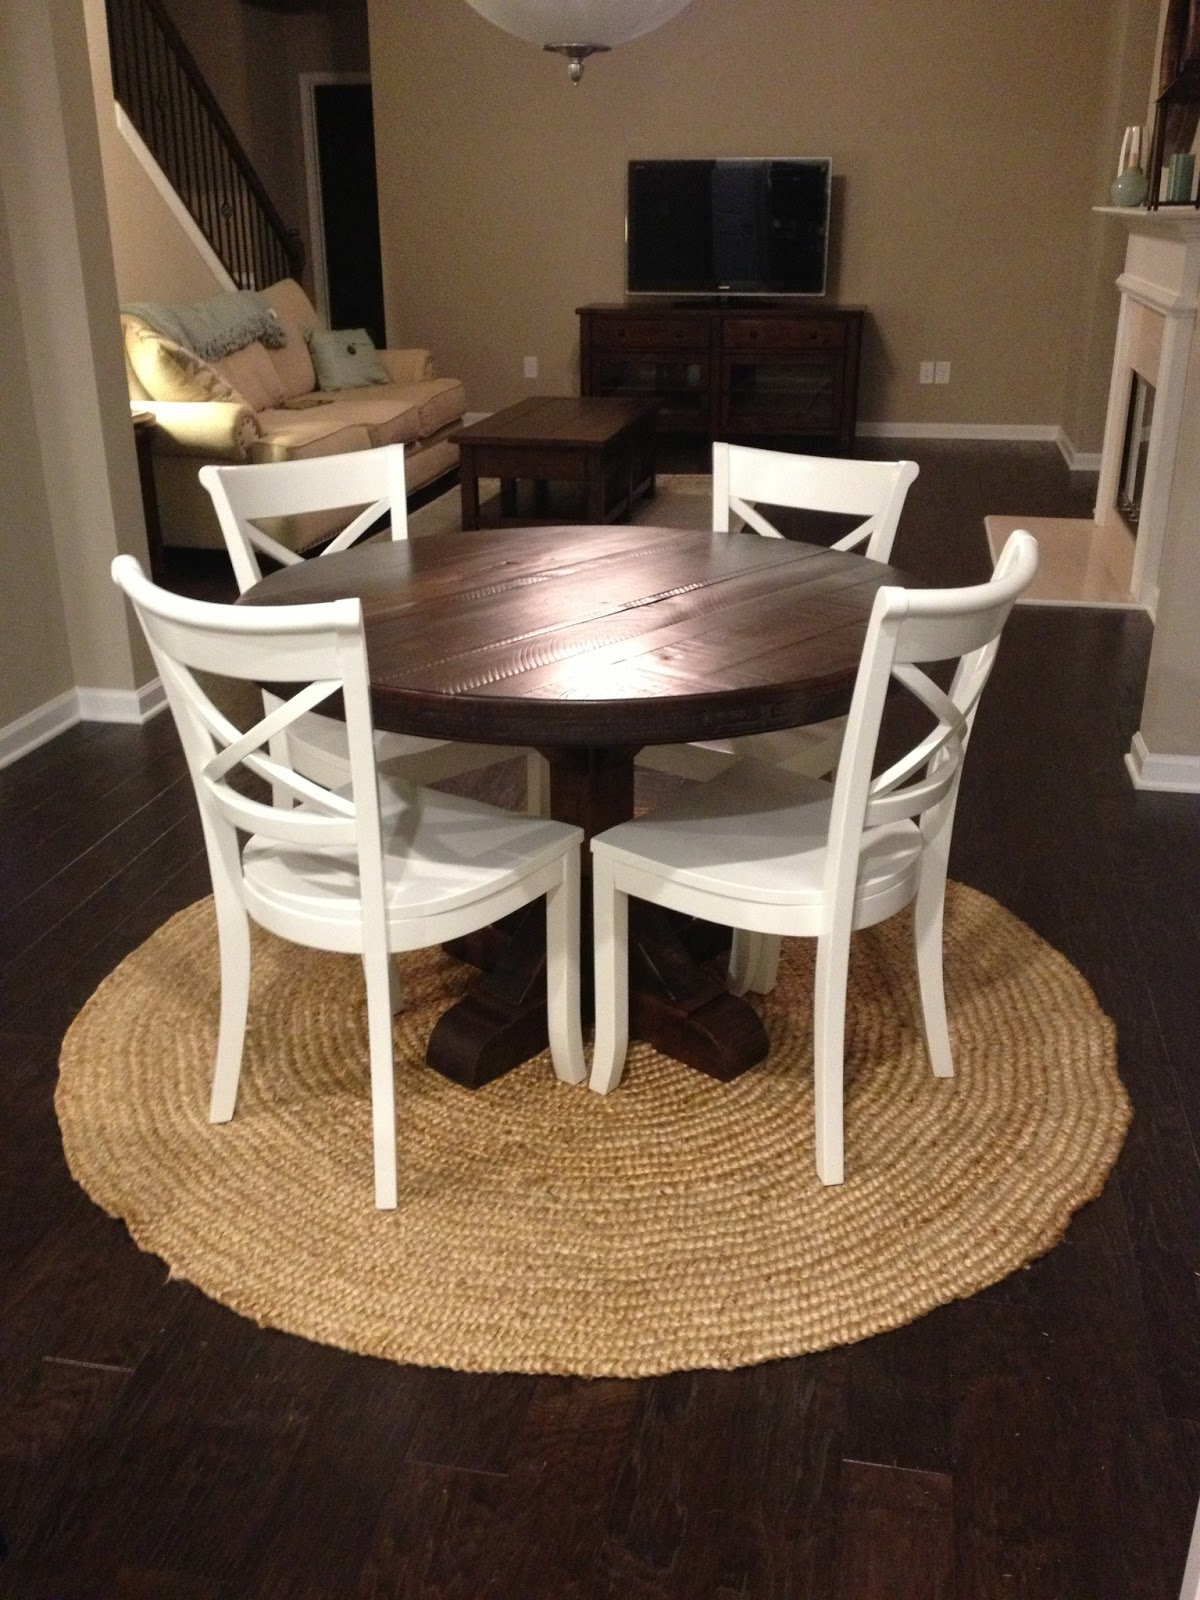 Attirant Rustic Round Pedestal Table $1600 $2100